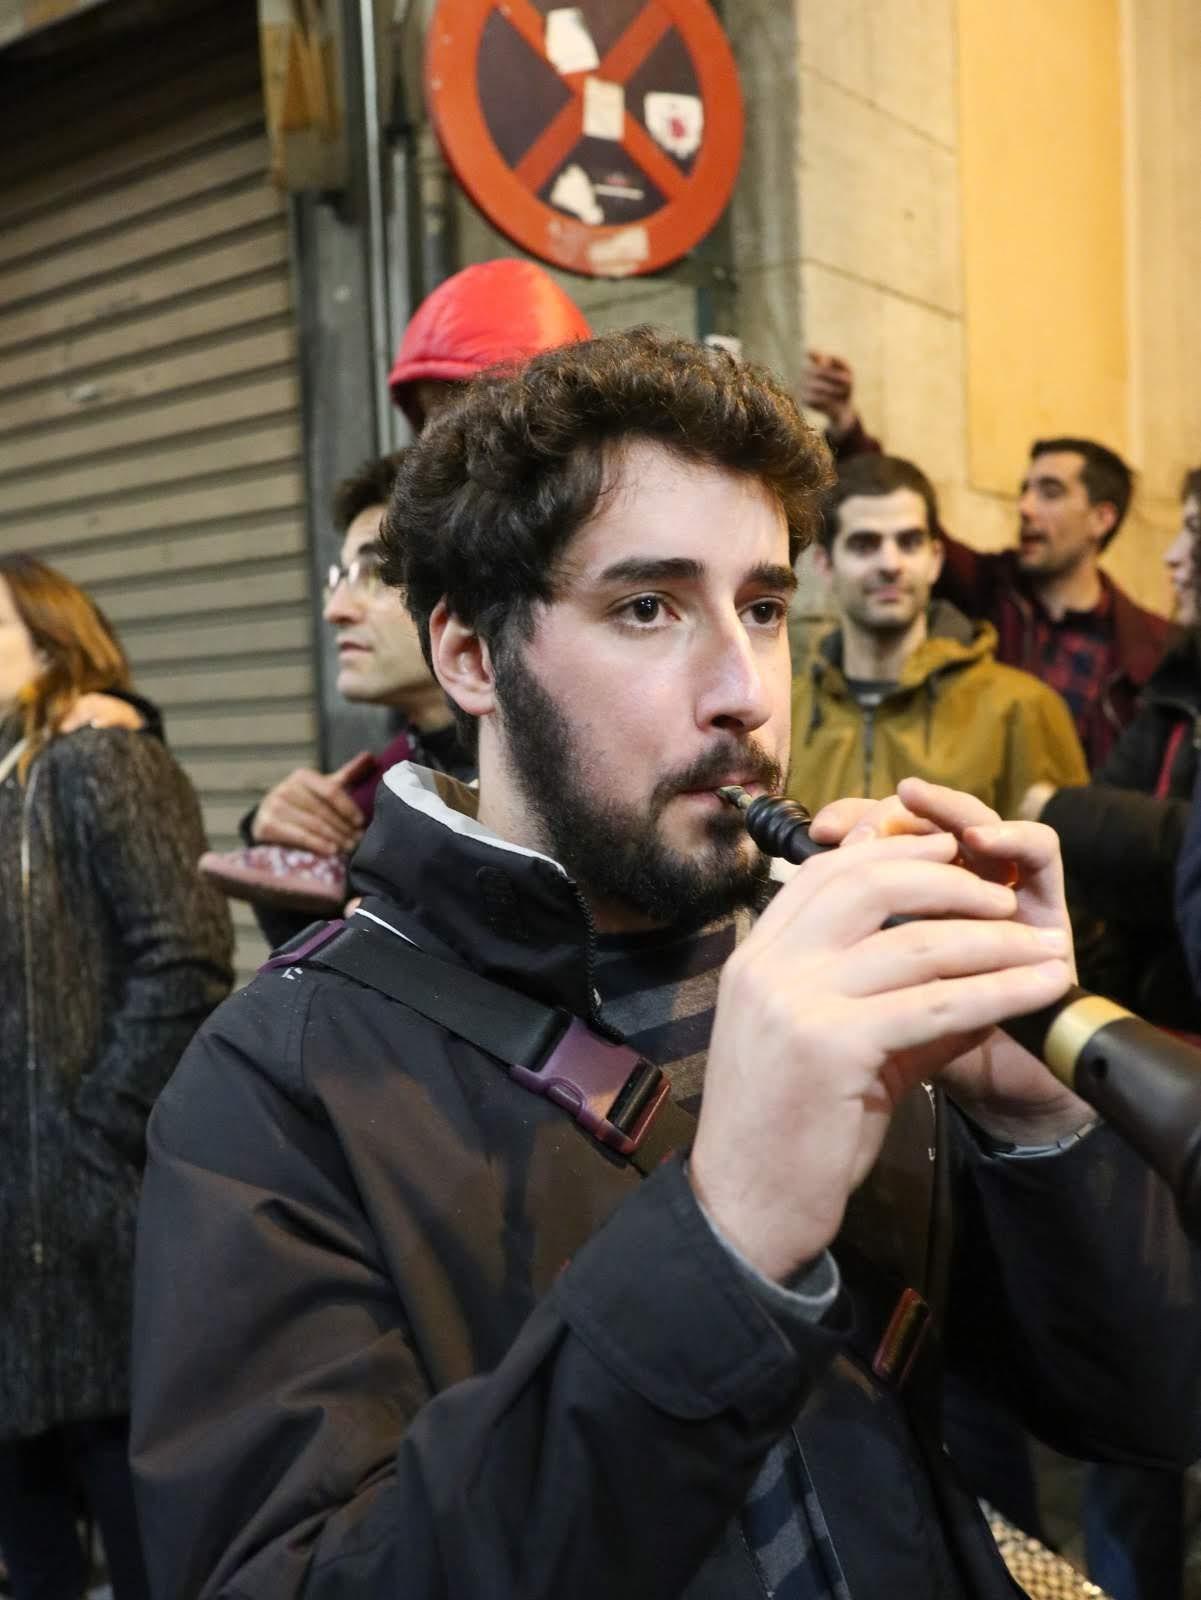 Pablo Sirvent